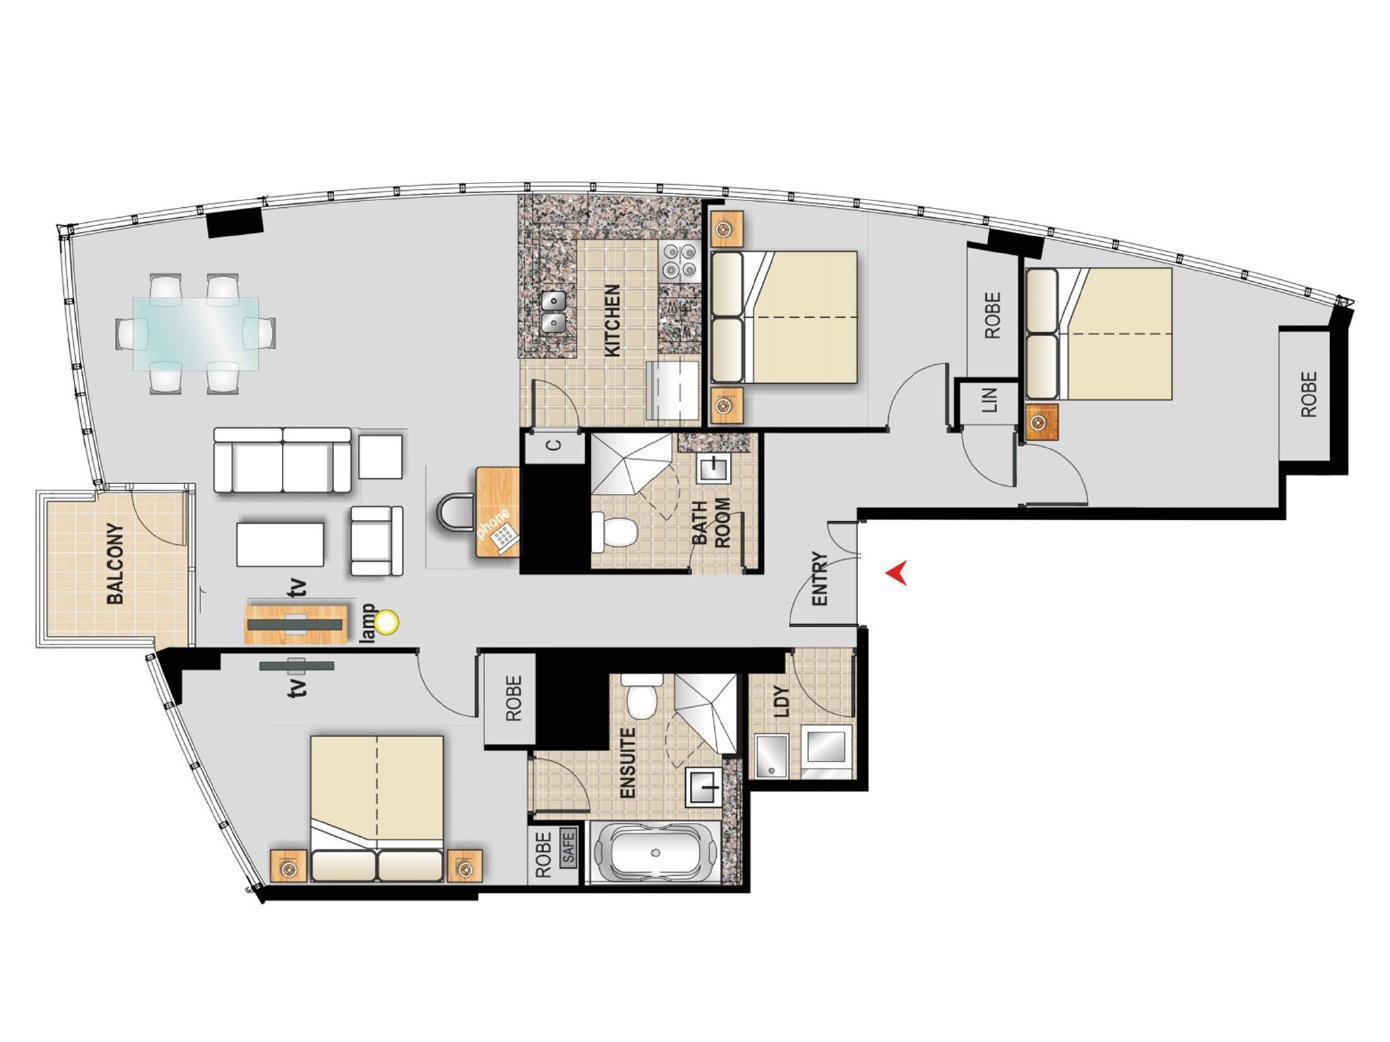 Australia Hotel Accommodation Cheap | Floor Plans